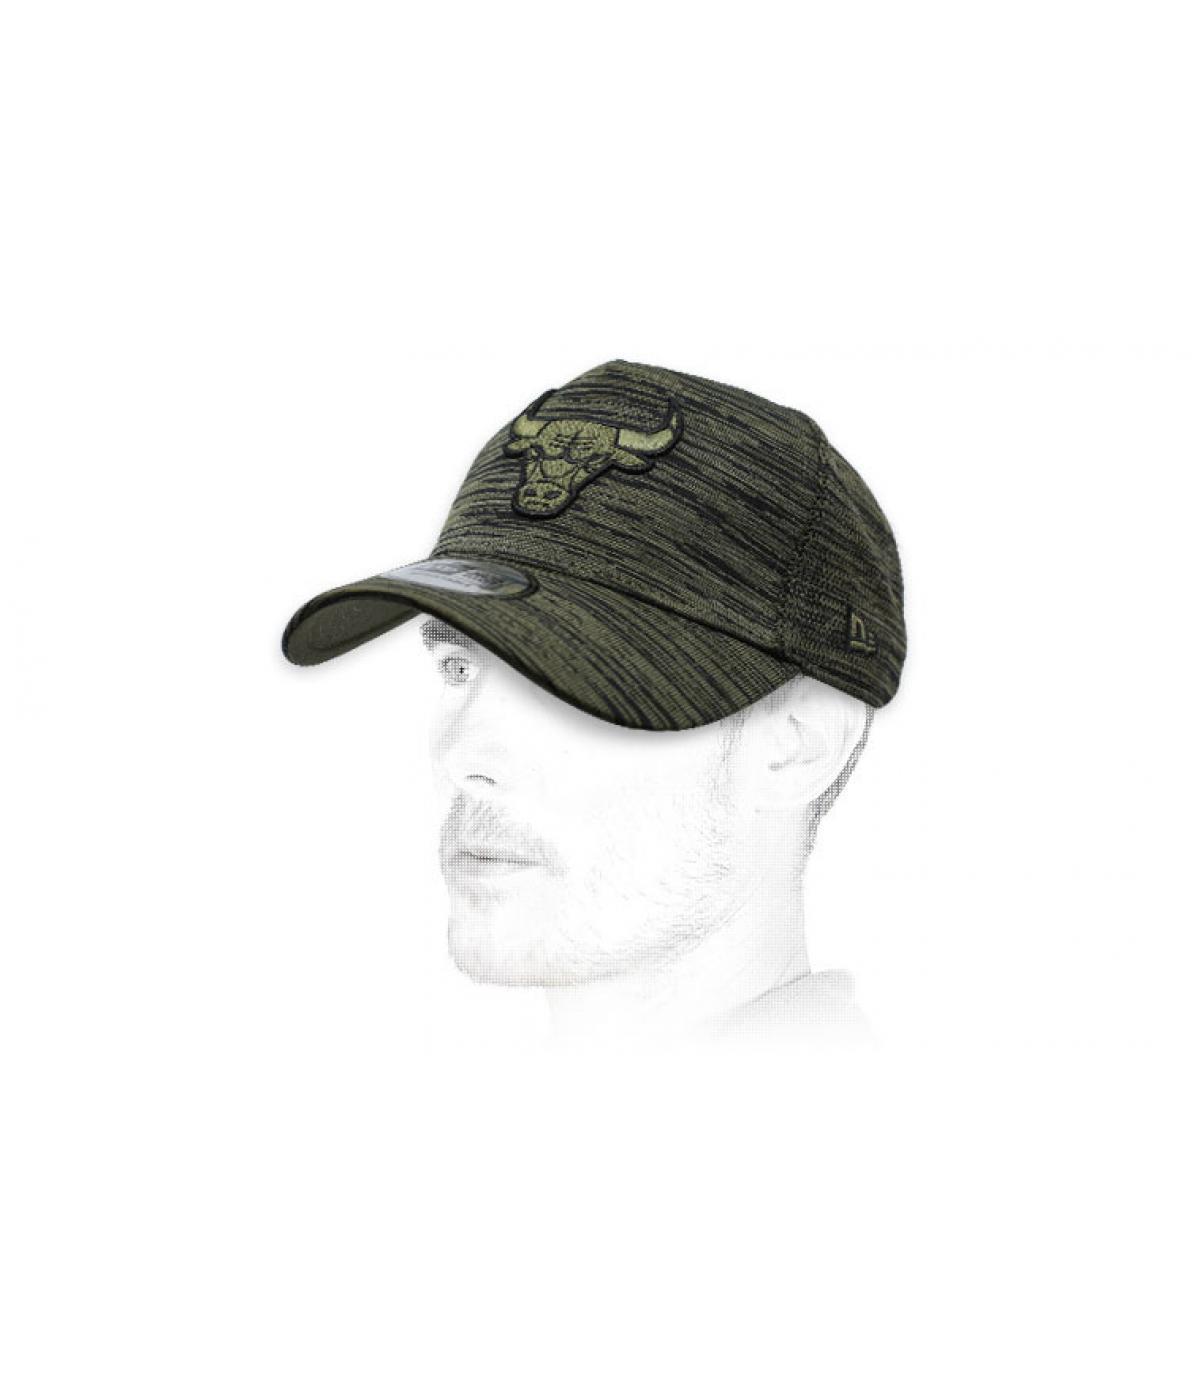 Bulls green heather cap